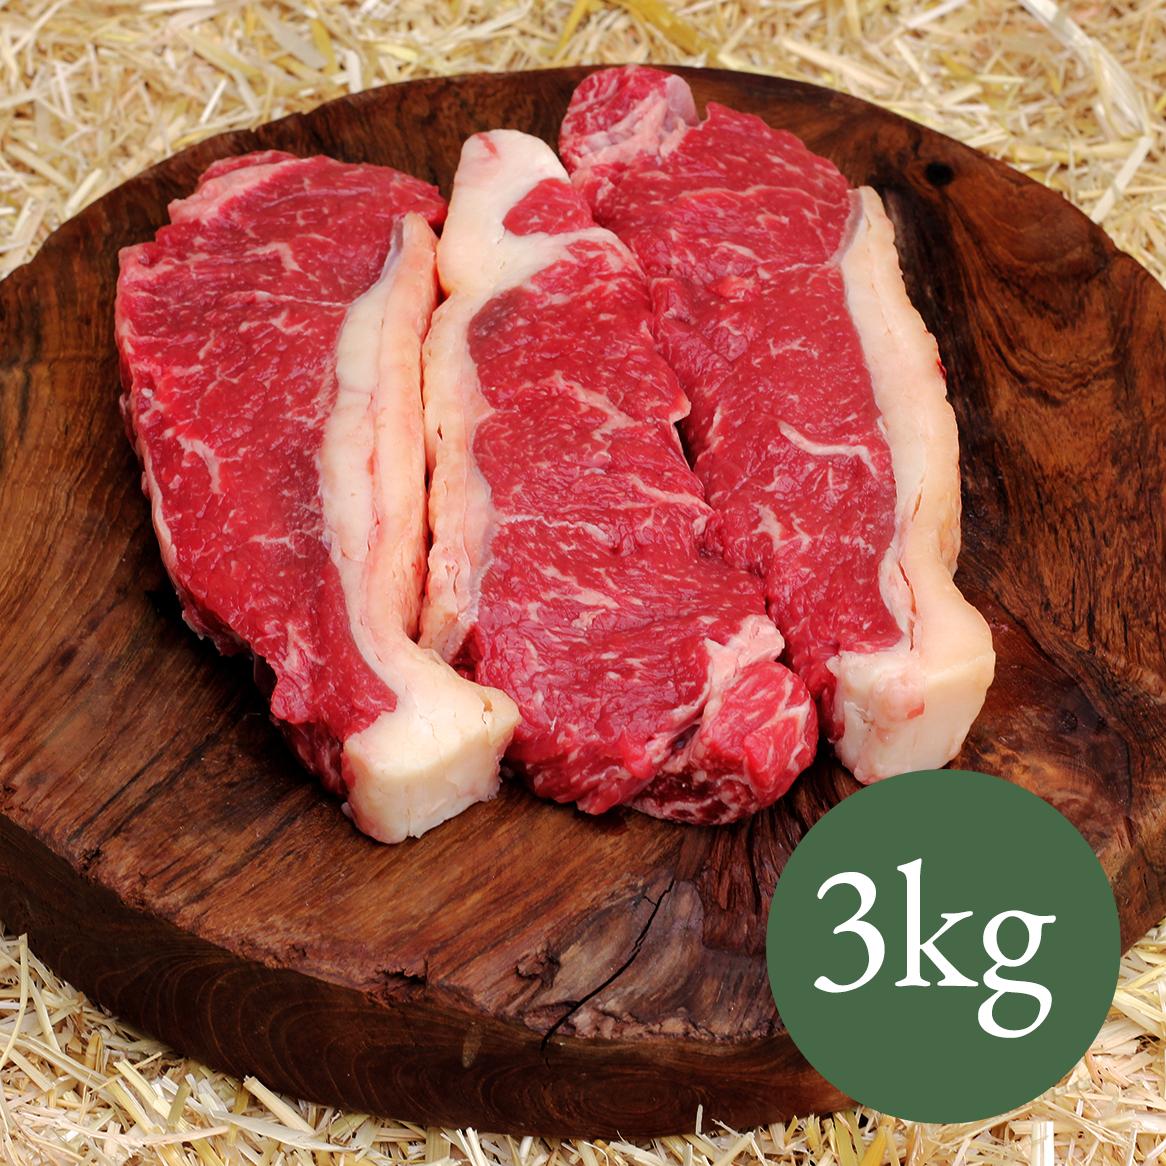 3kg Beef Box